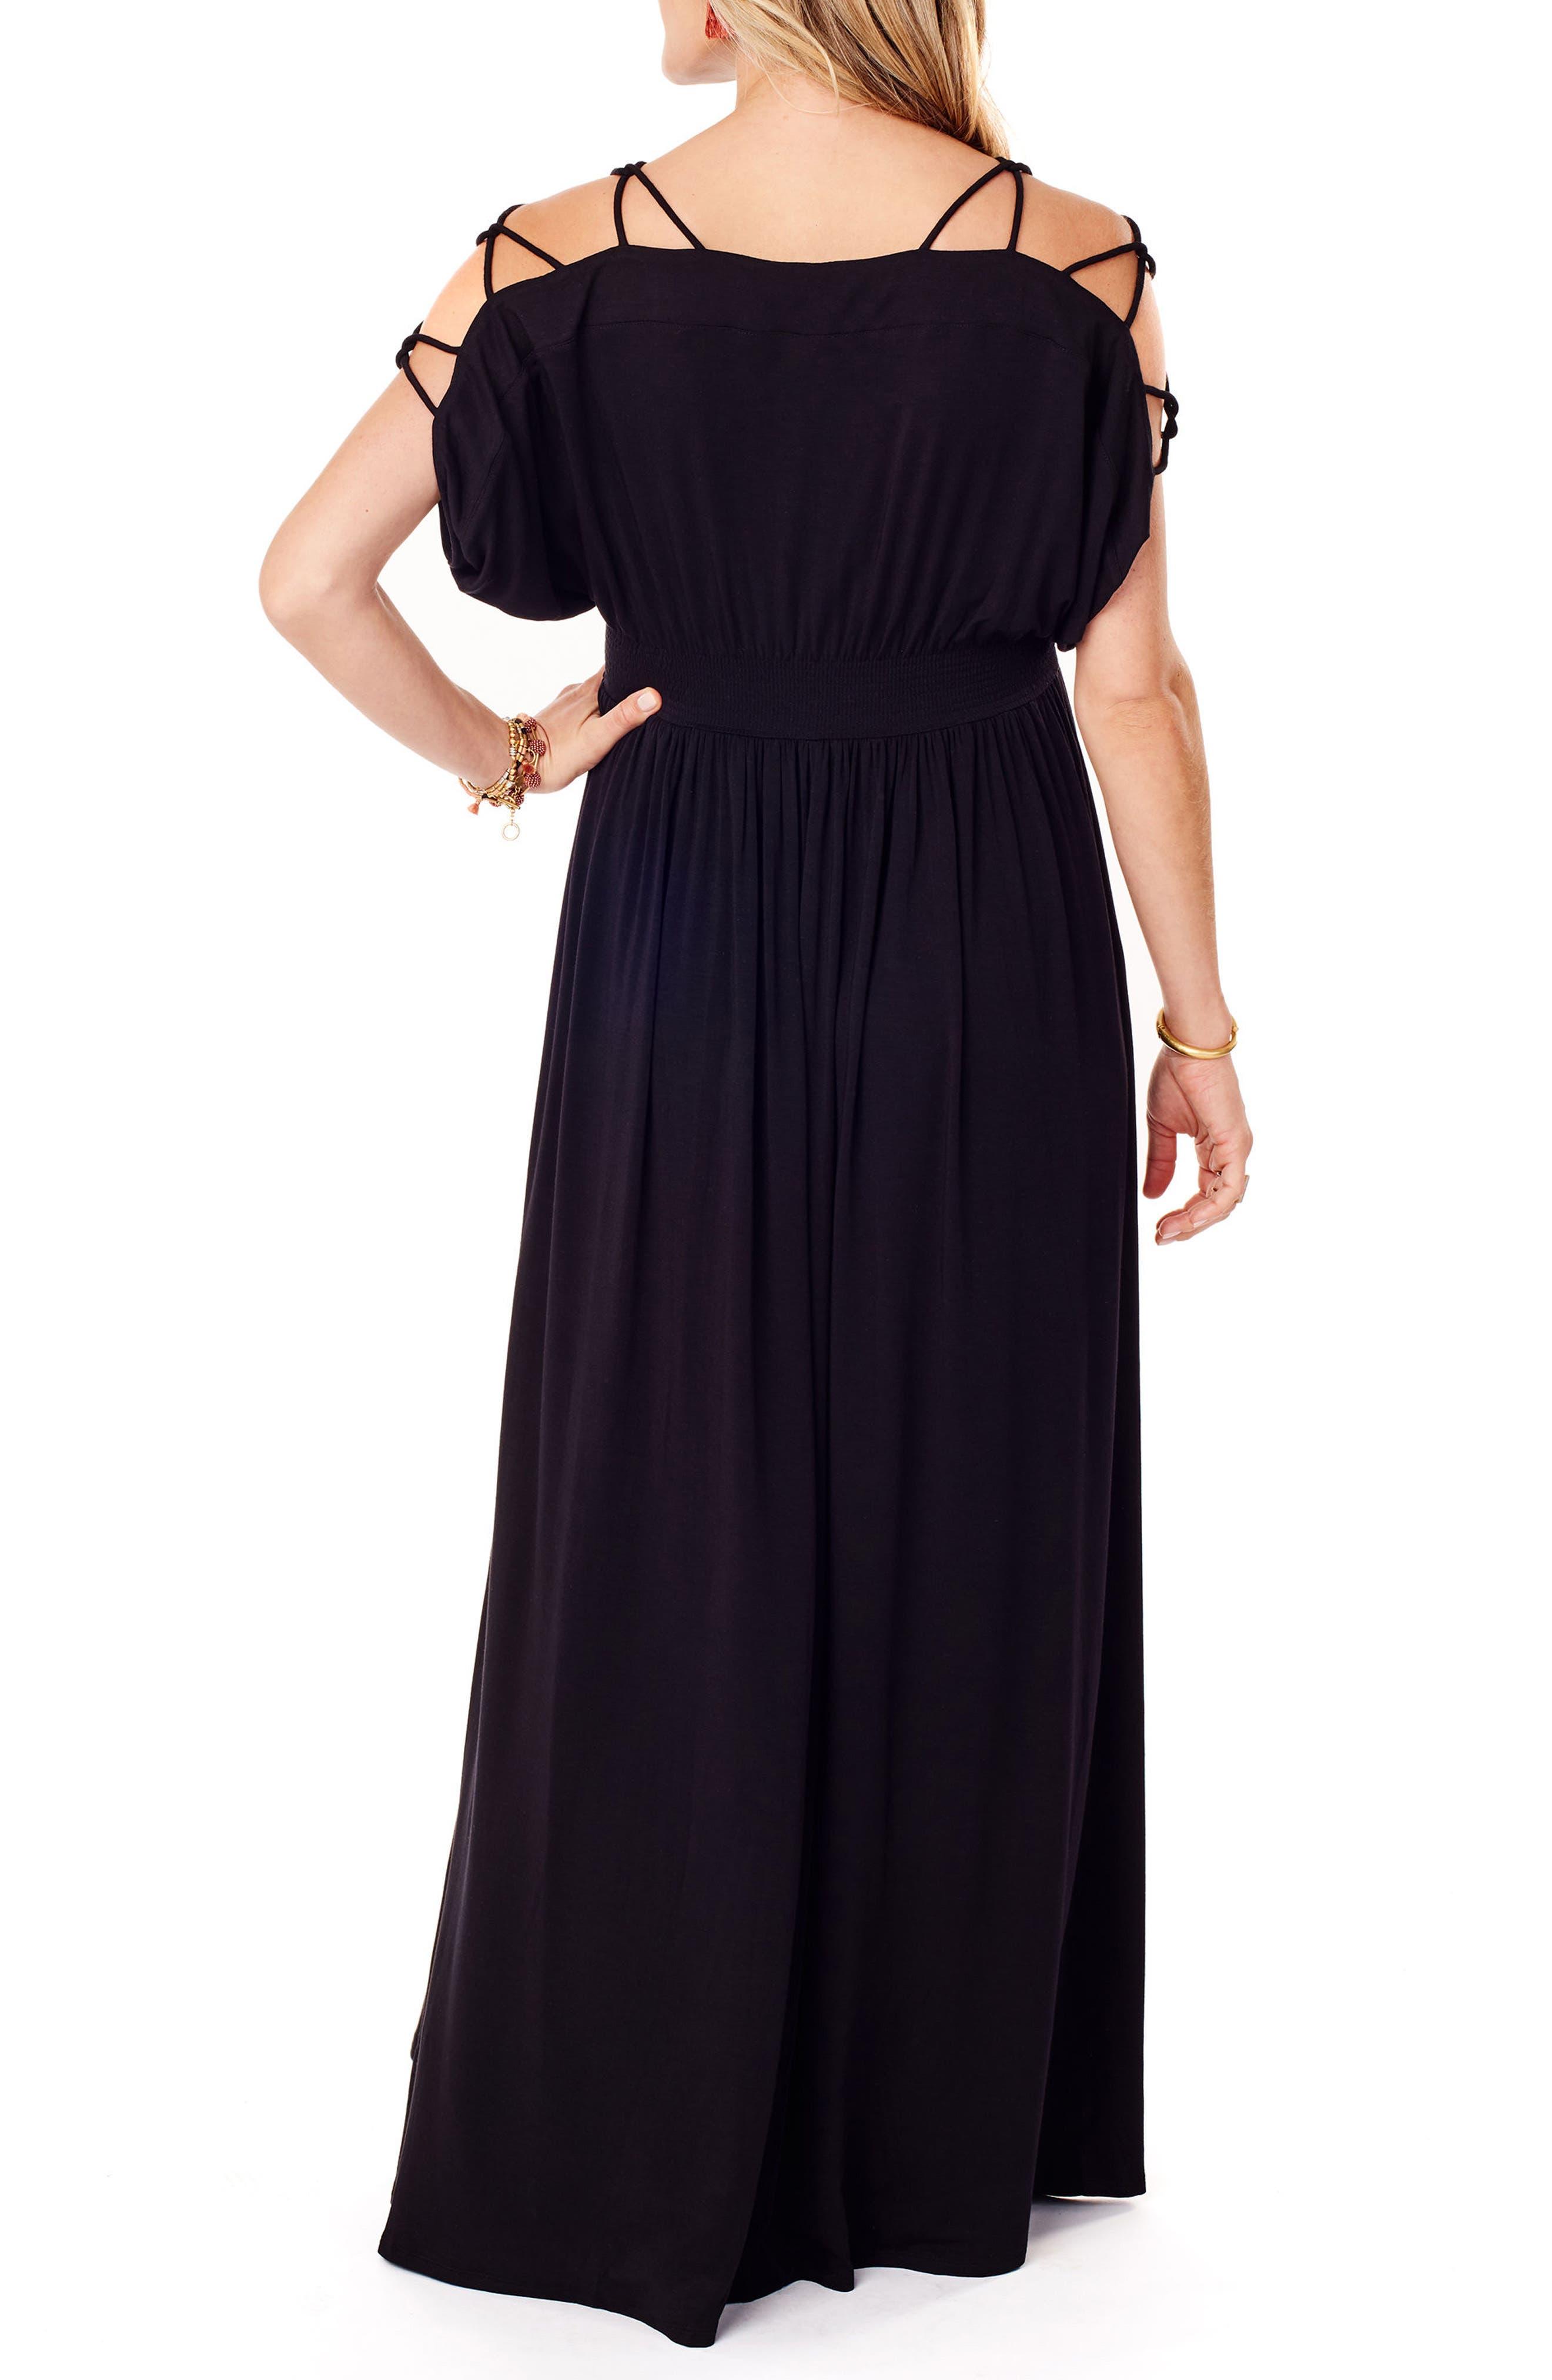 Smocked Empire Waist Maternity Maxi Dress,                             Alternate thumbnail 2, color,                             JET BLACK